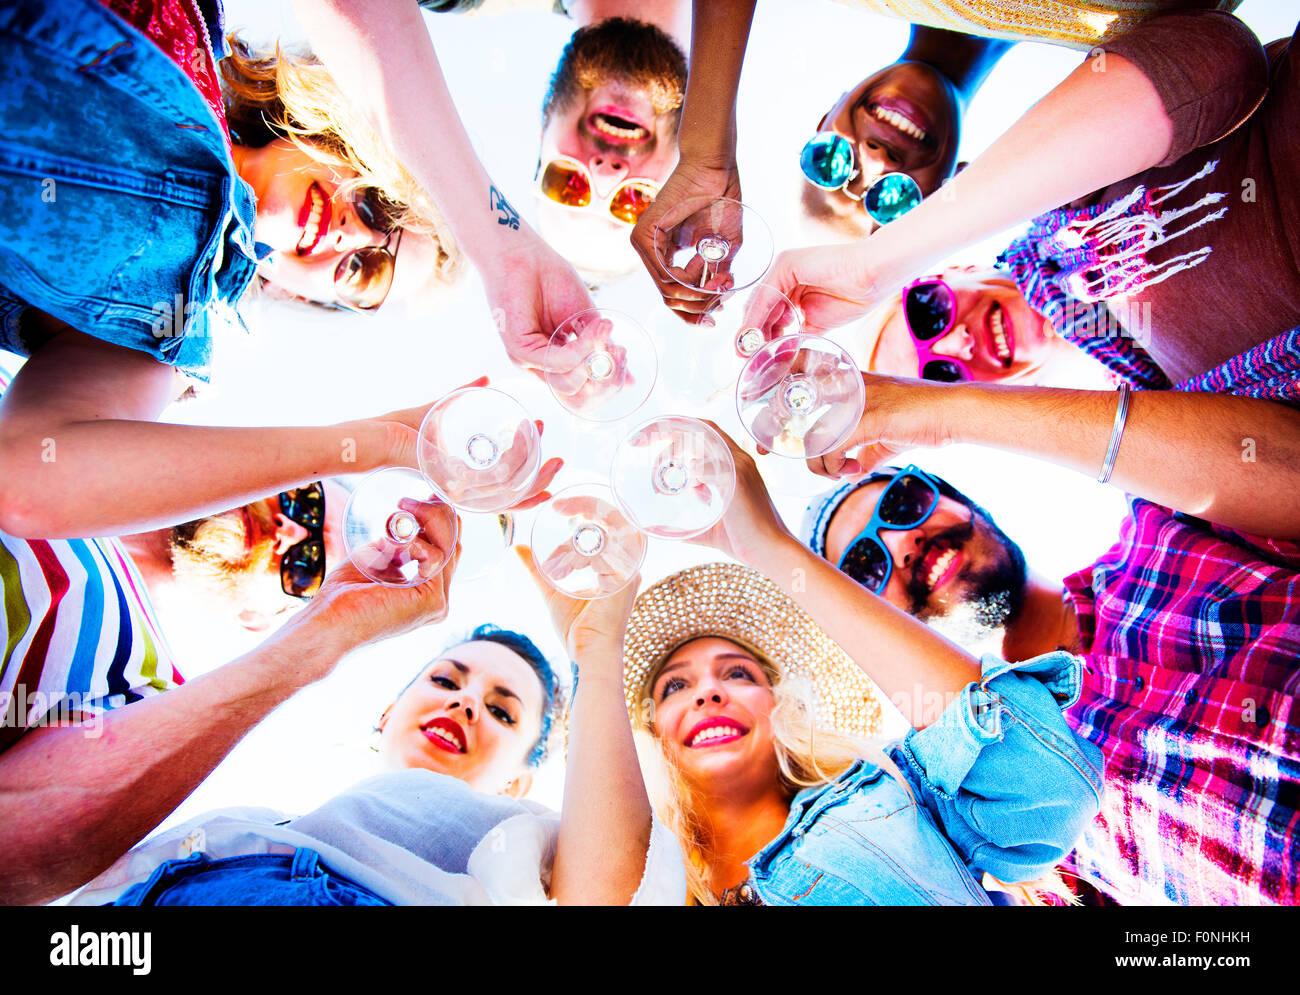 Playa Fiesta Cheers amistad verano divertido concepto Imagen De Stock